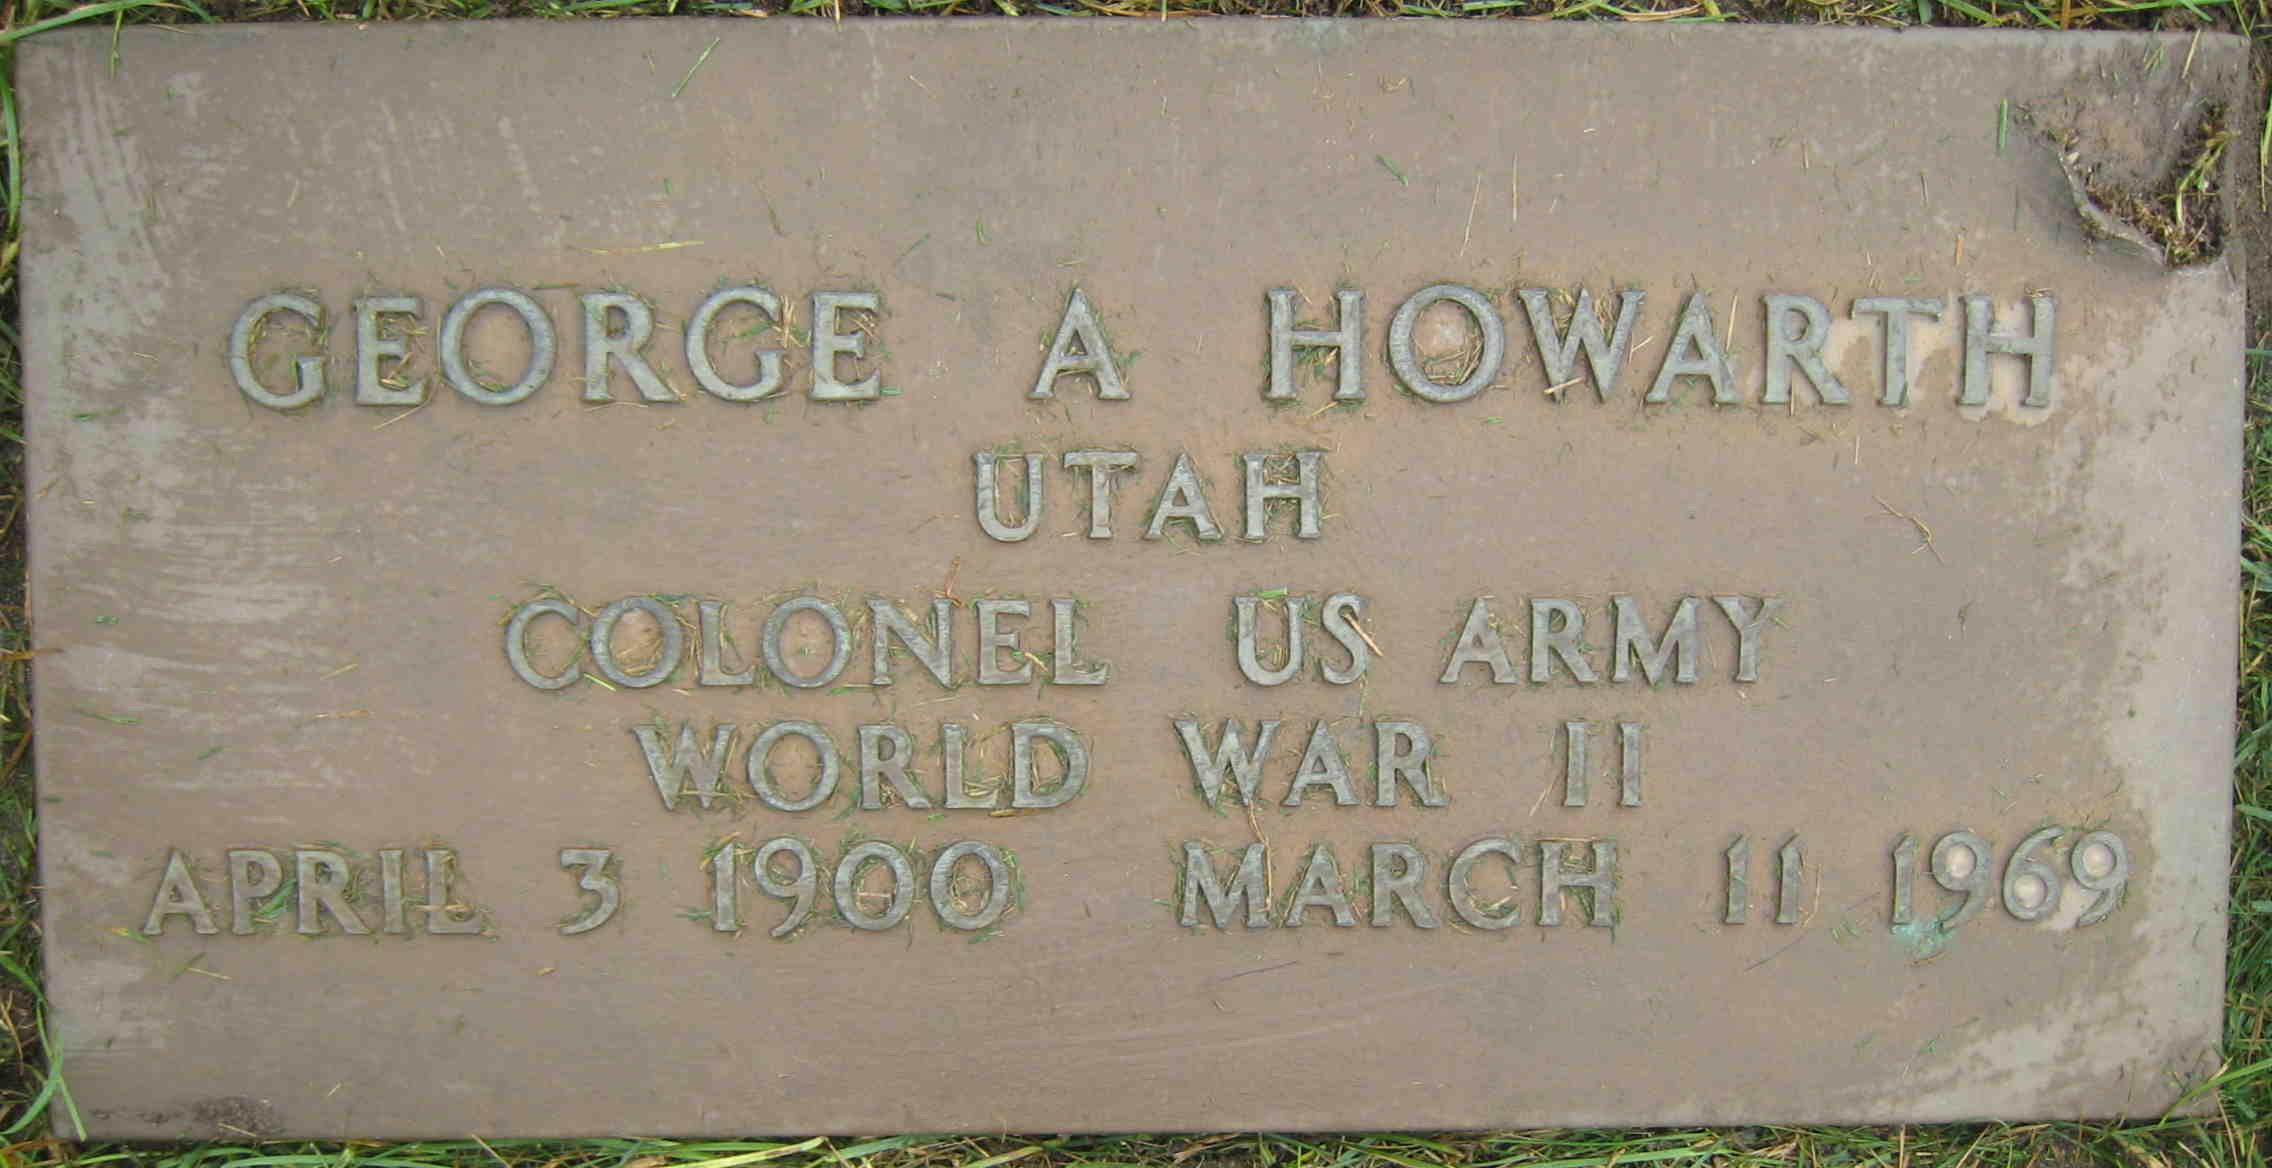 George W Howarth